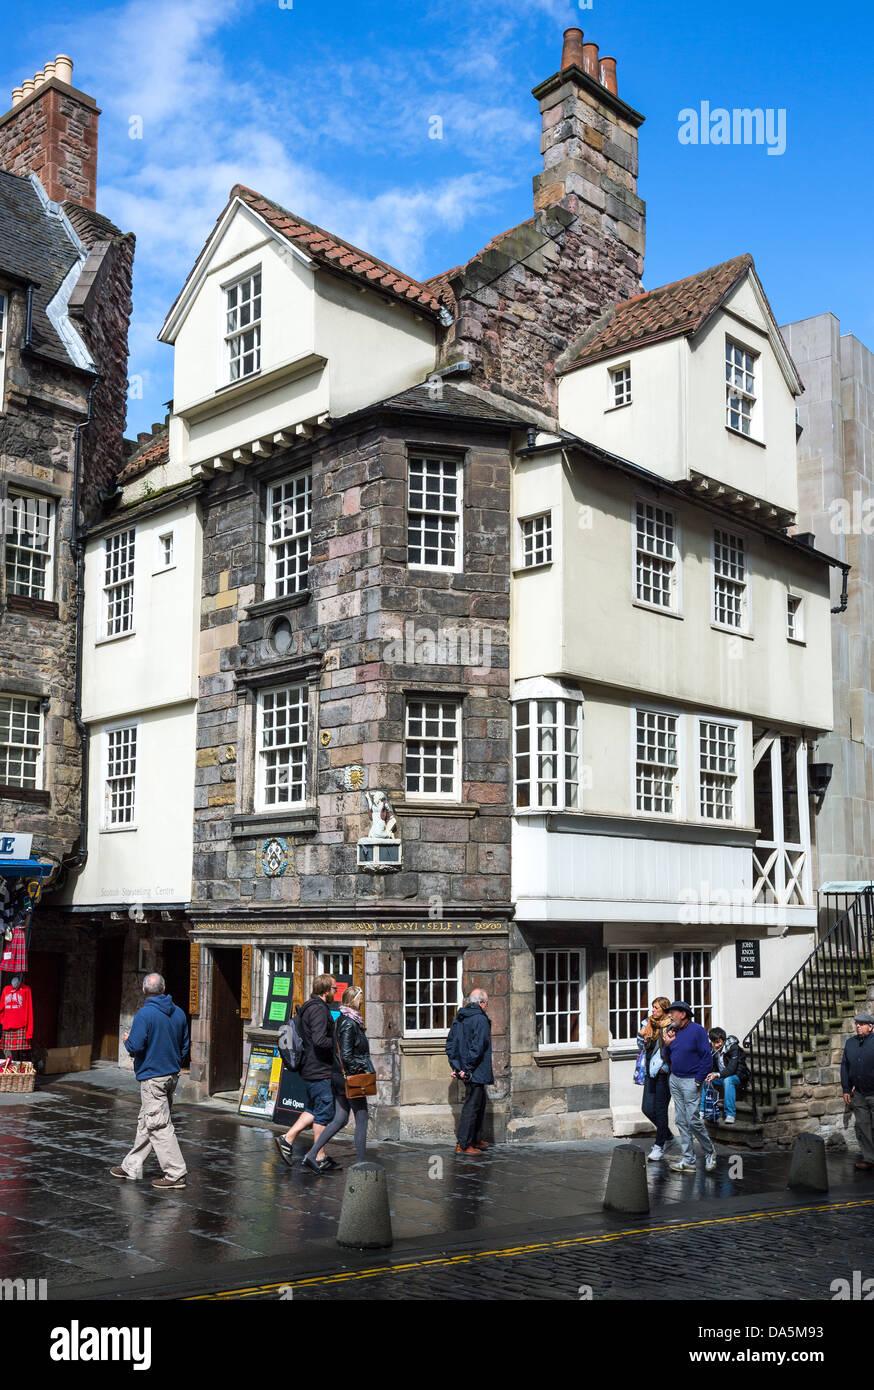 Europa-Großbritannien, Schottland, Edinburgh, Royal Mile, Canongate, das John Knox Haus. Stockfoto